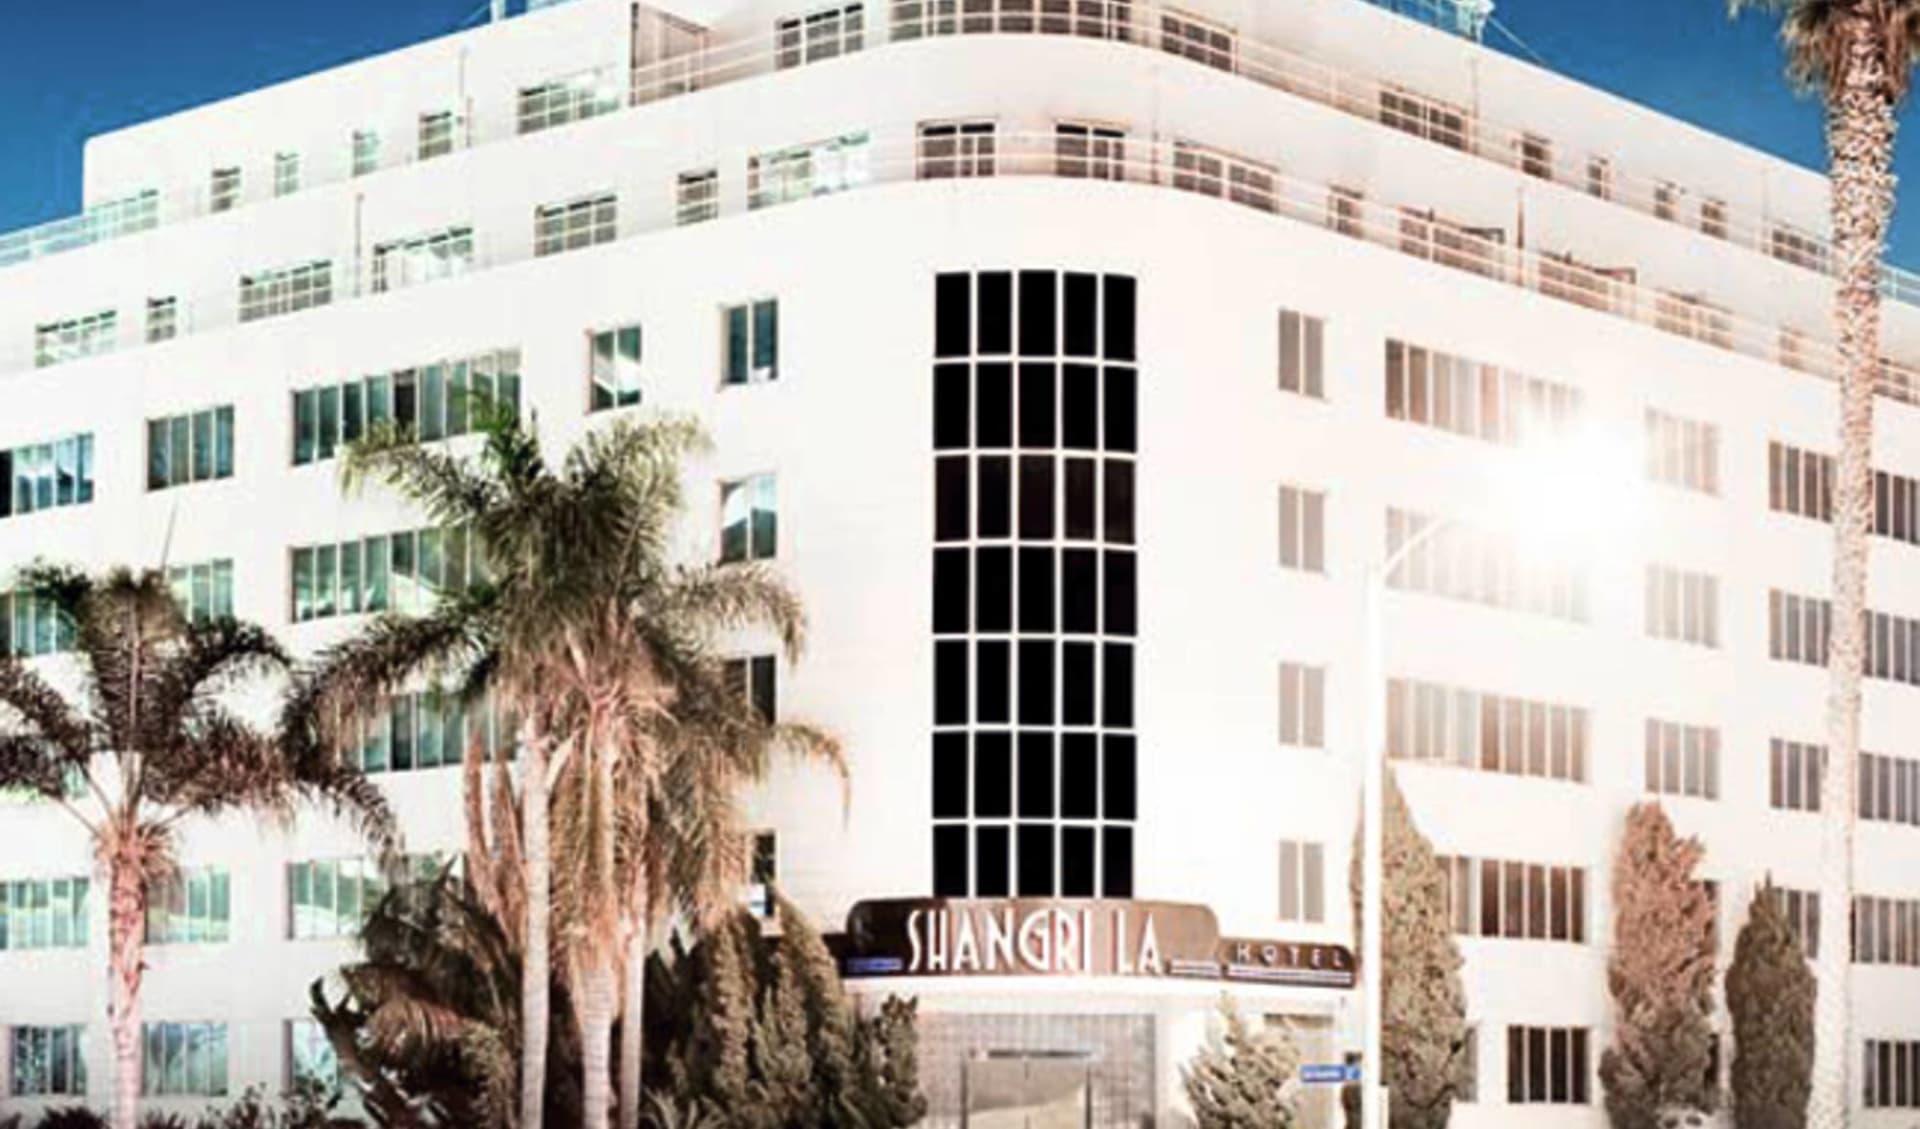 Shangri-La Hotel in Santa Monica:  Shangri La Hotel - Hotelansicht mit Palmen